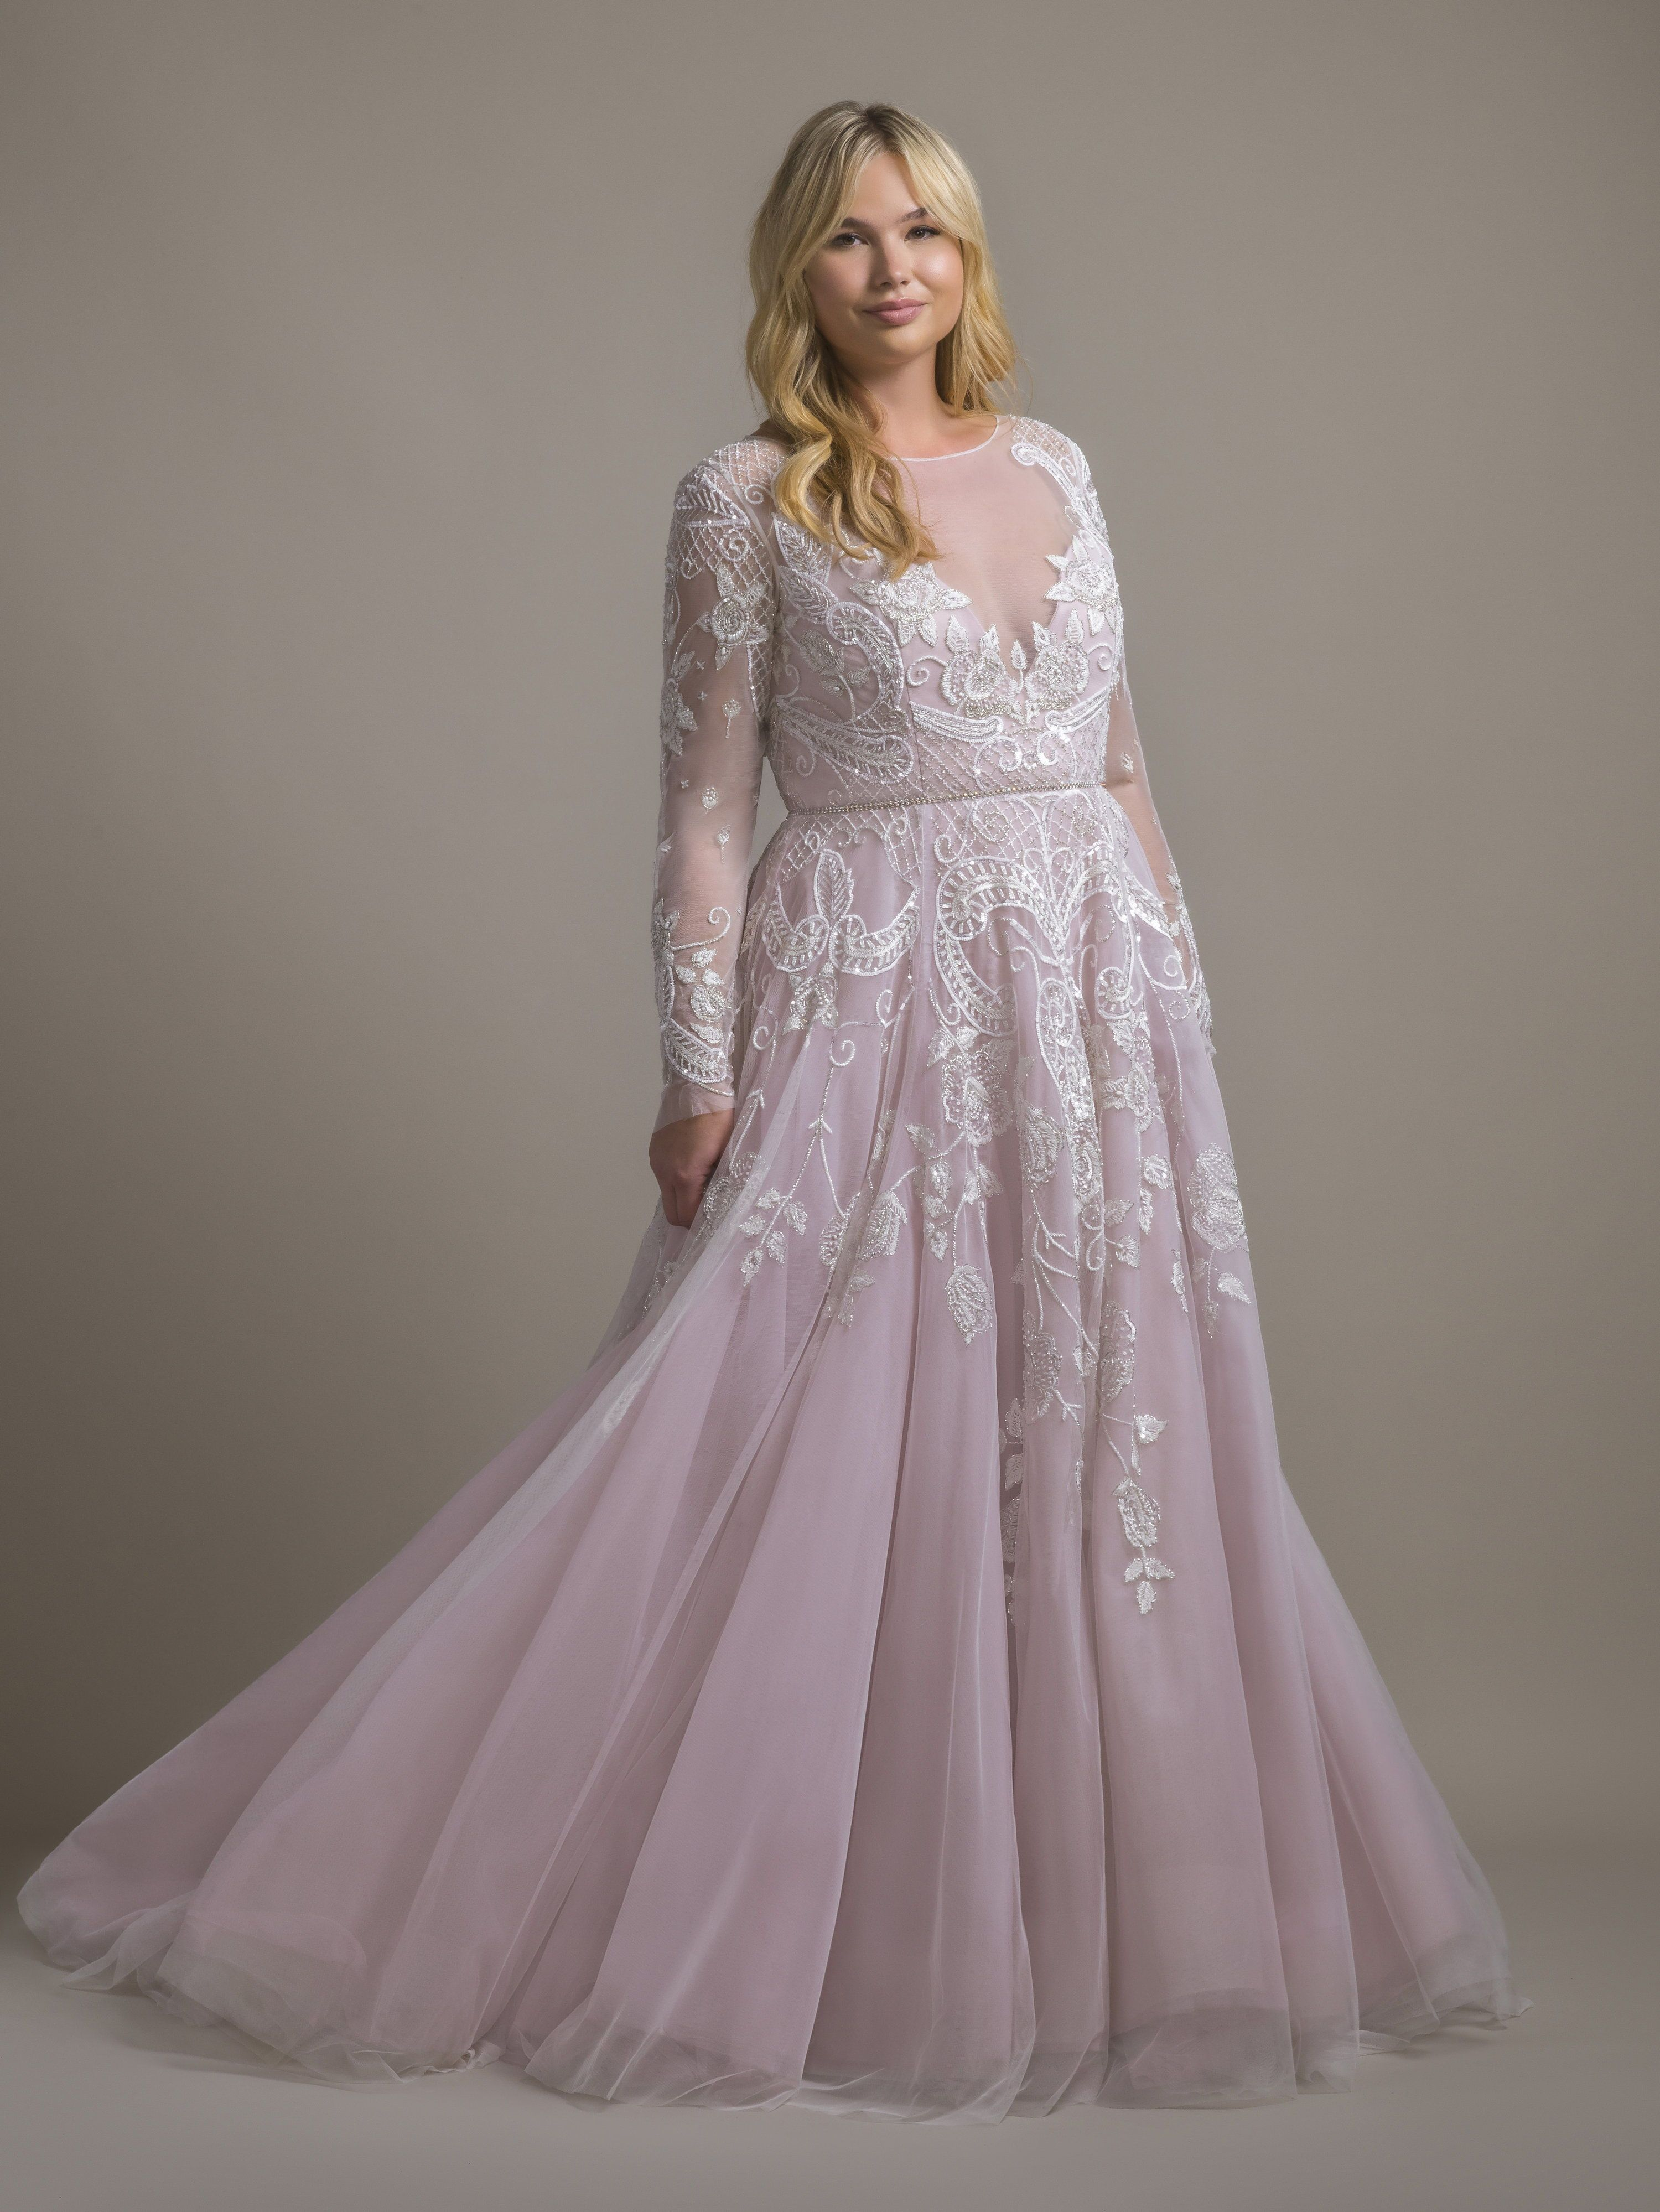 Hayley Hayley Paige Aline Wedding Dress Princess